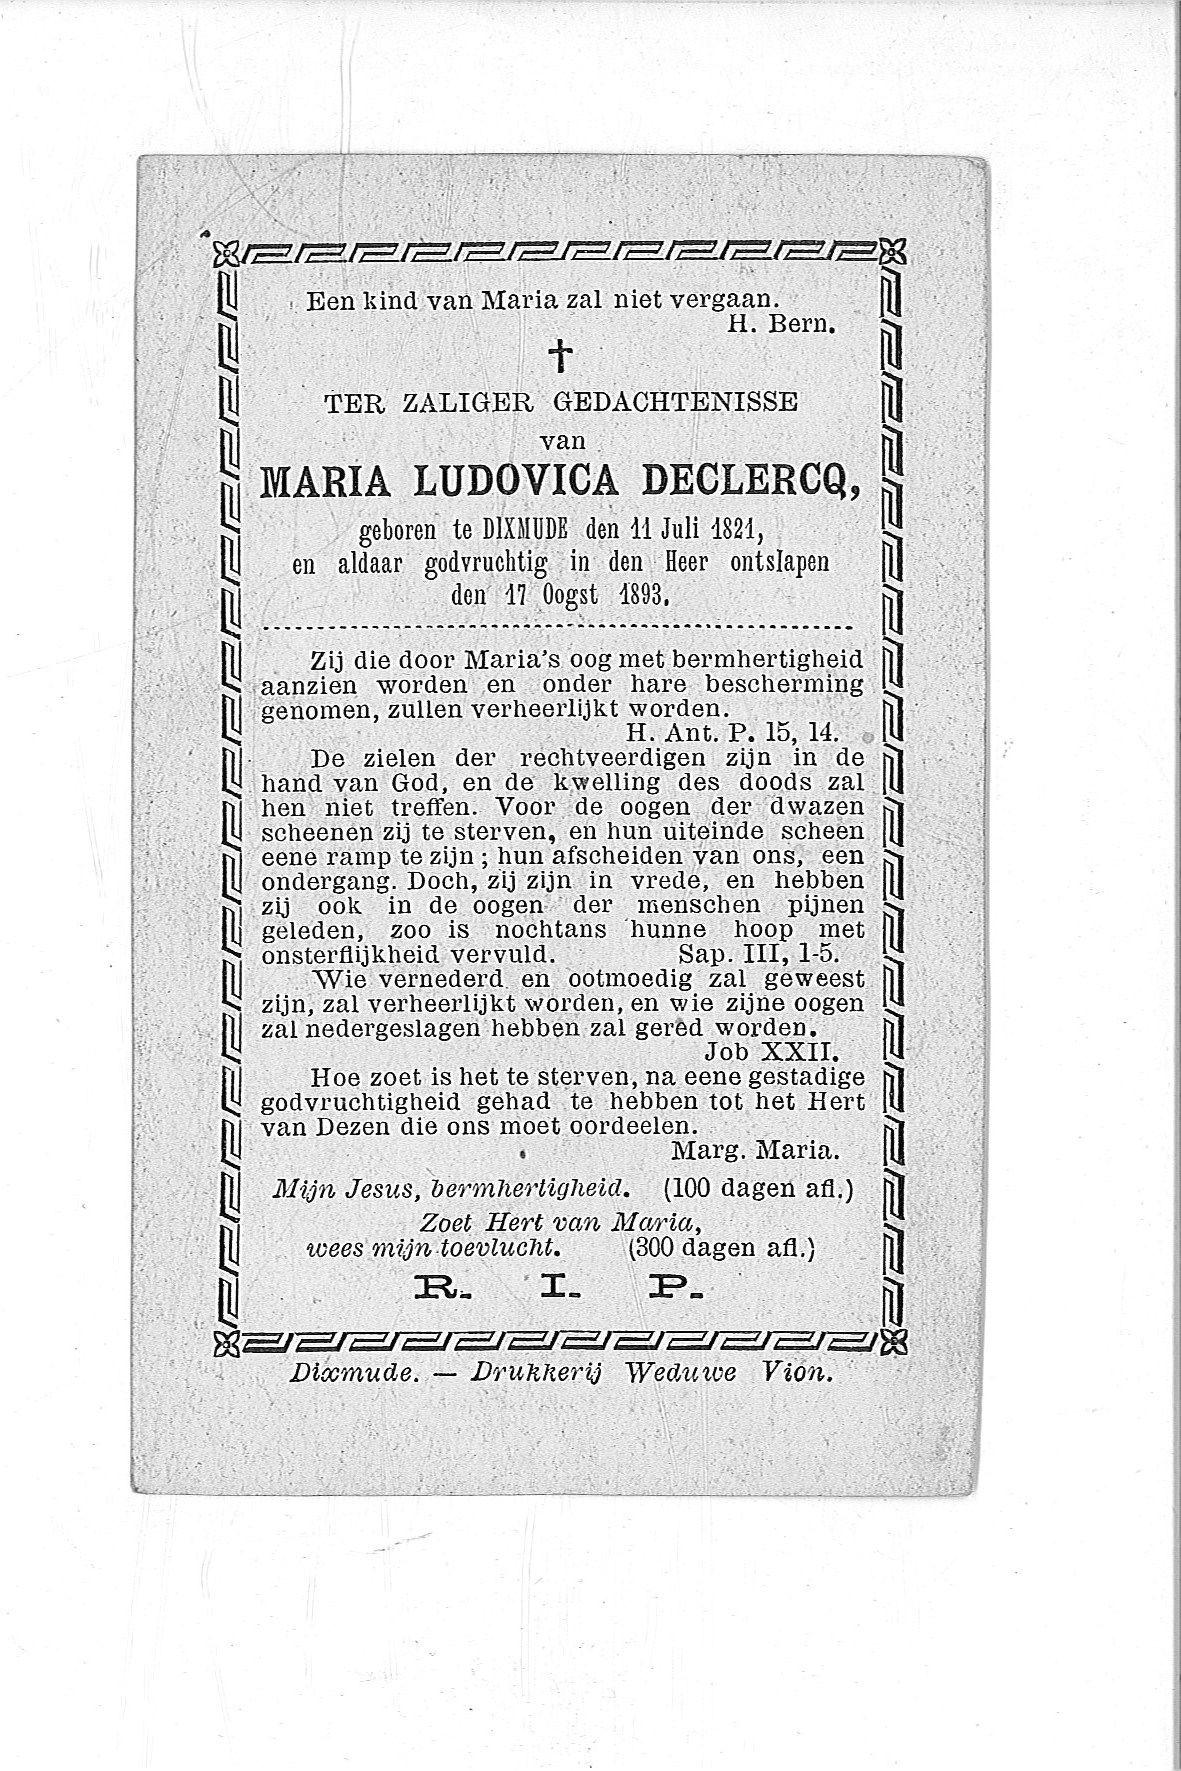 Maria-Ludovica(1893)20090903142539_00036.jpg